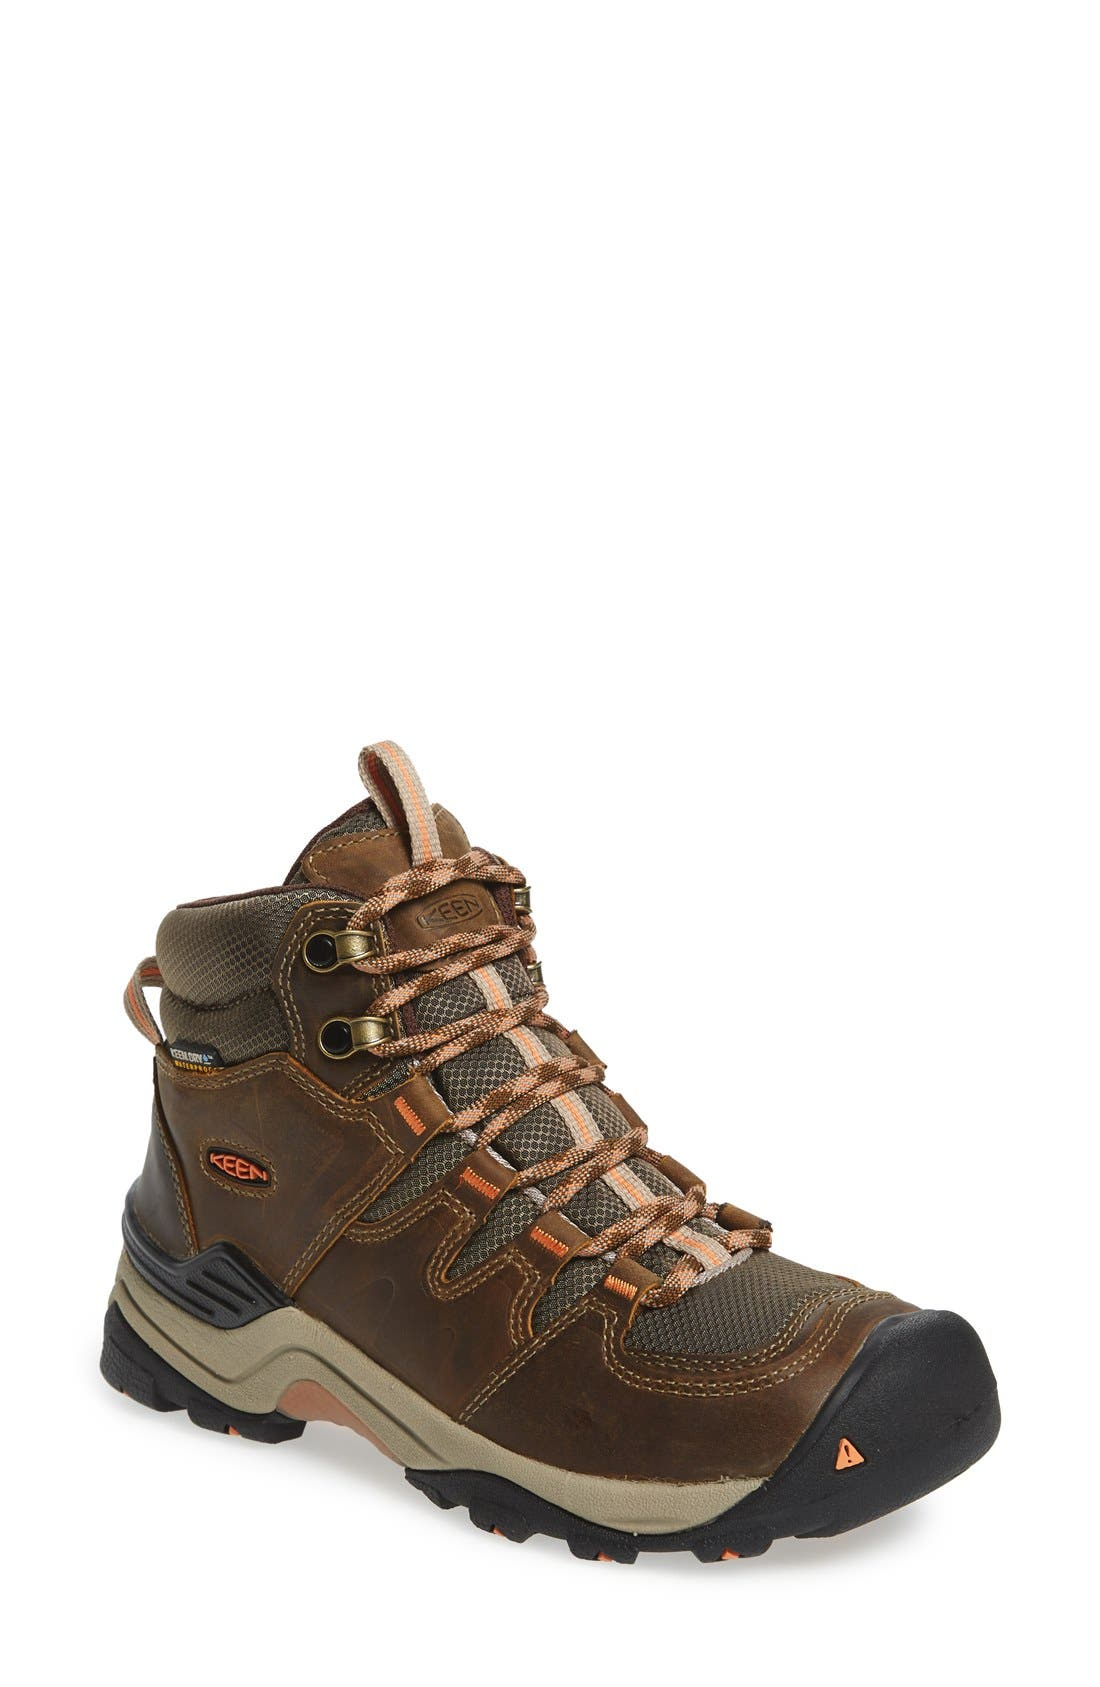 Gypsum II Mid Waterproof Hiking Boot,                             Main thumbnail 1, color,                             200